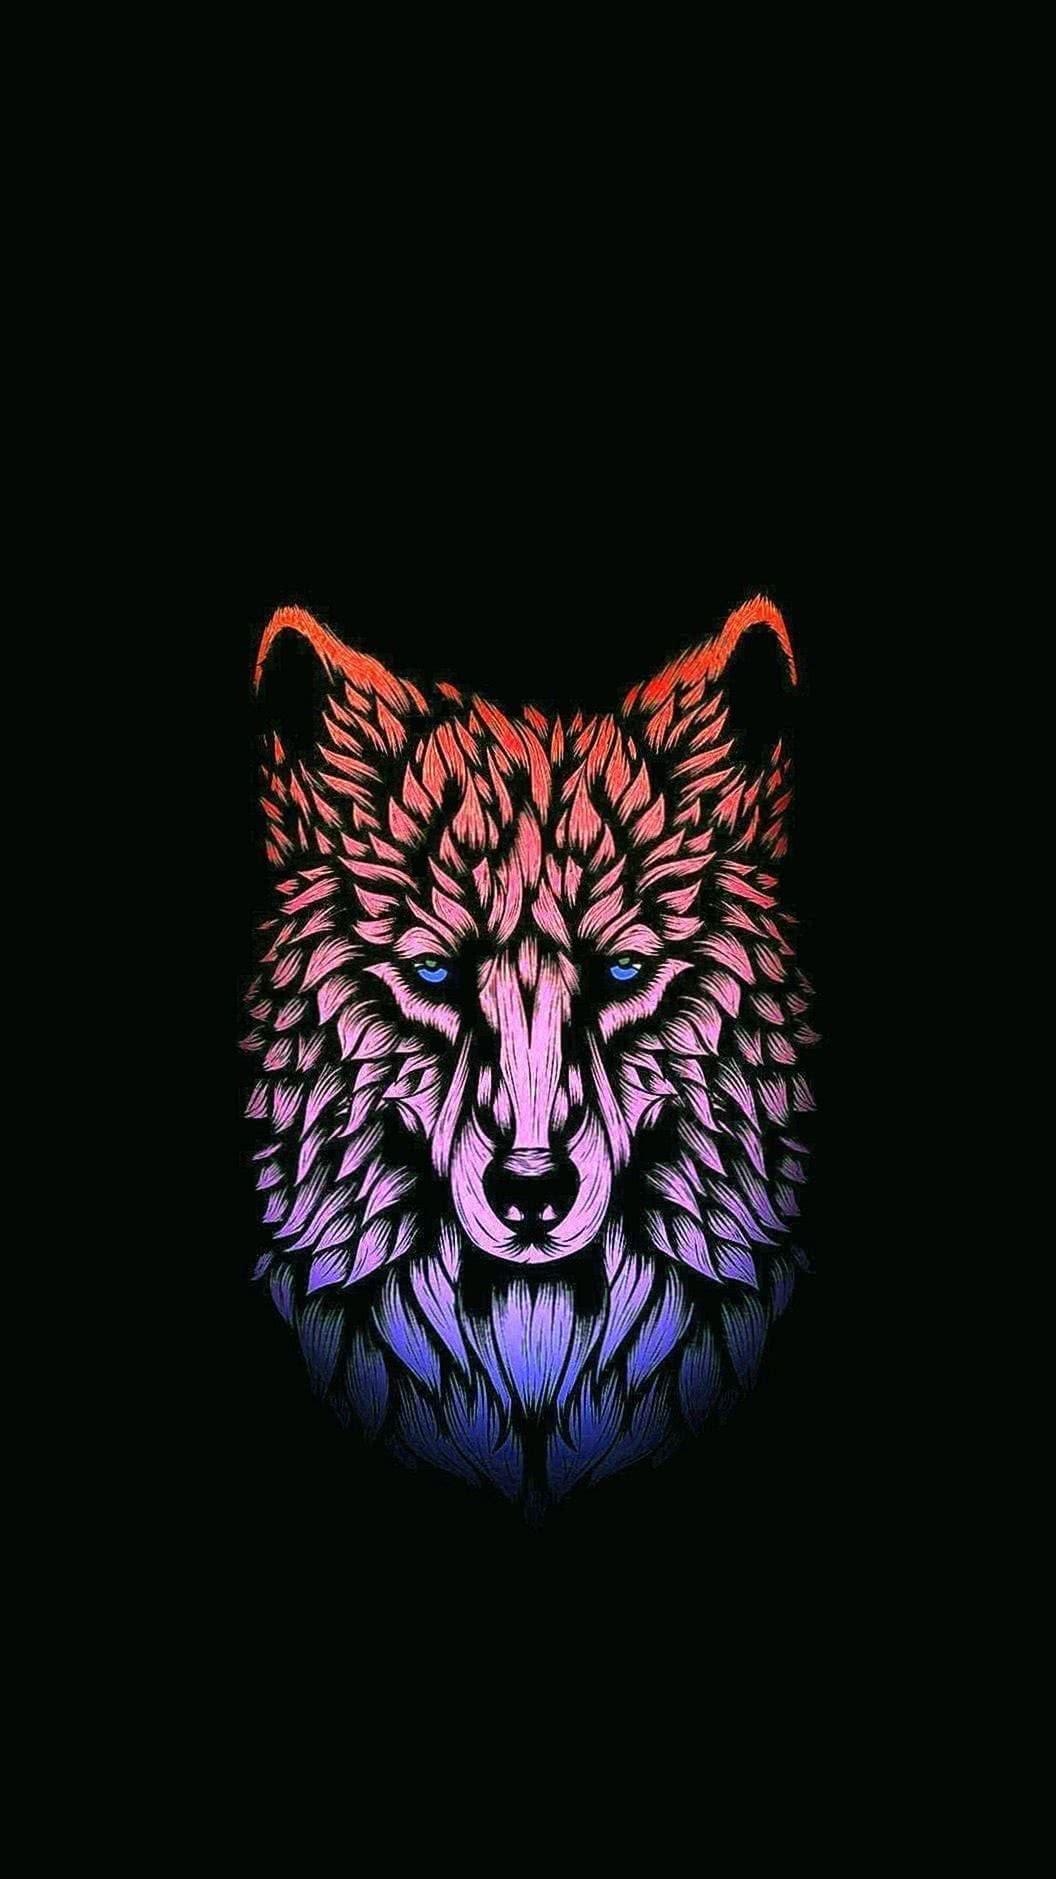 Amoled Wallpaper Wolf